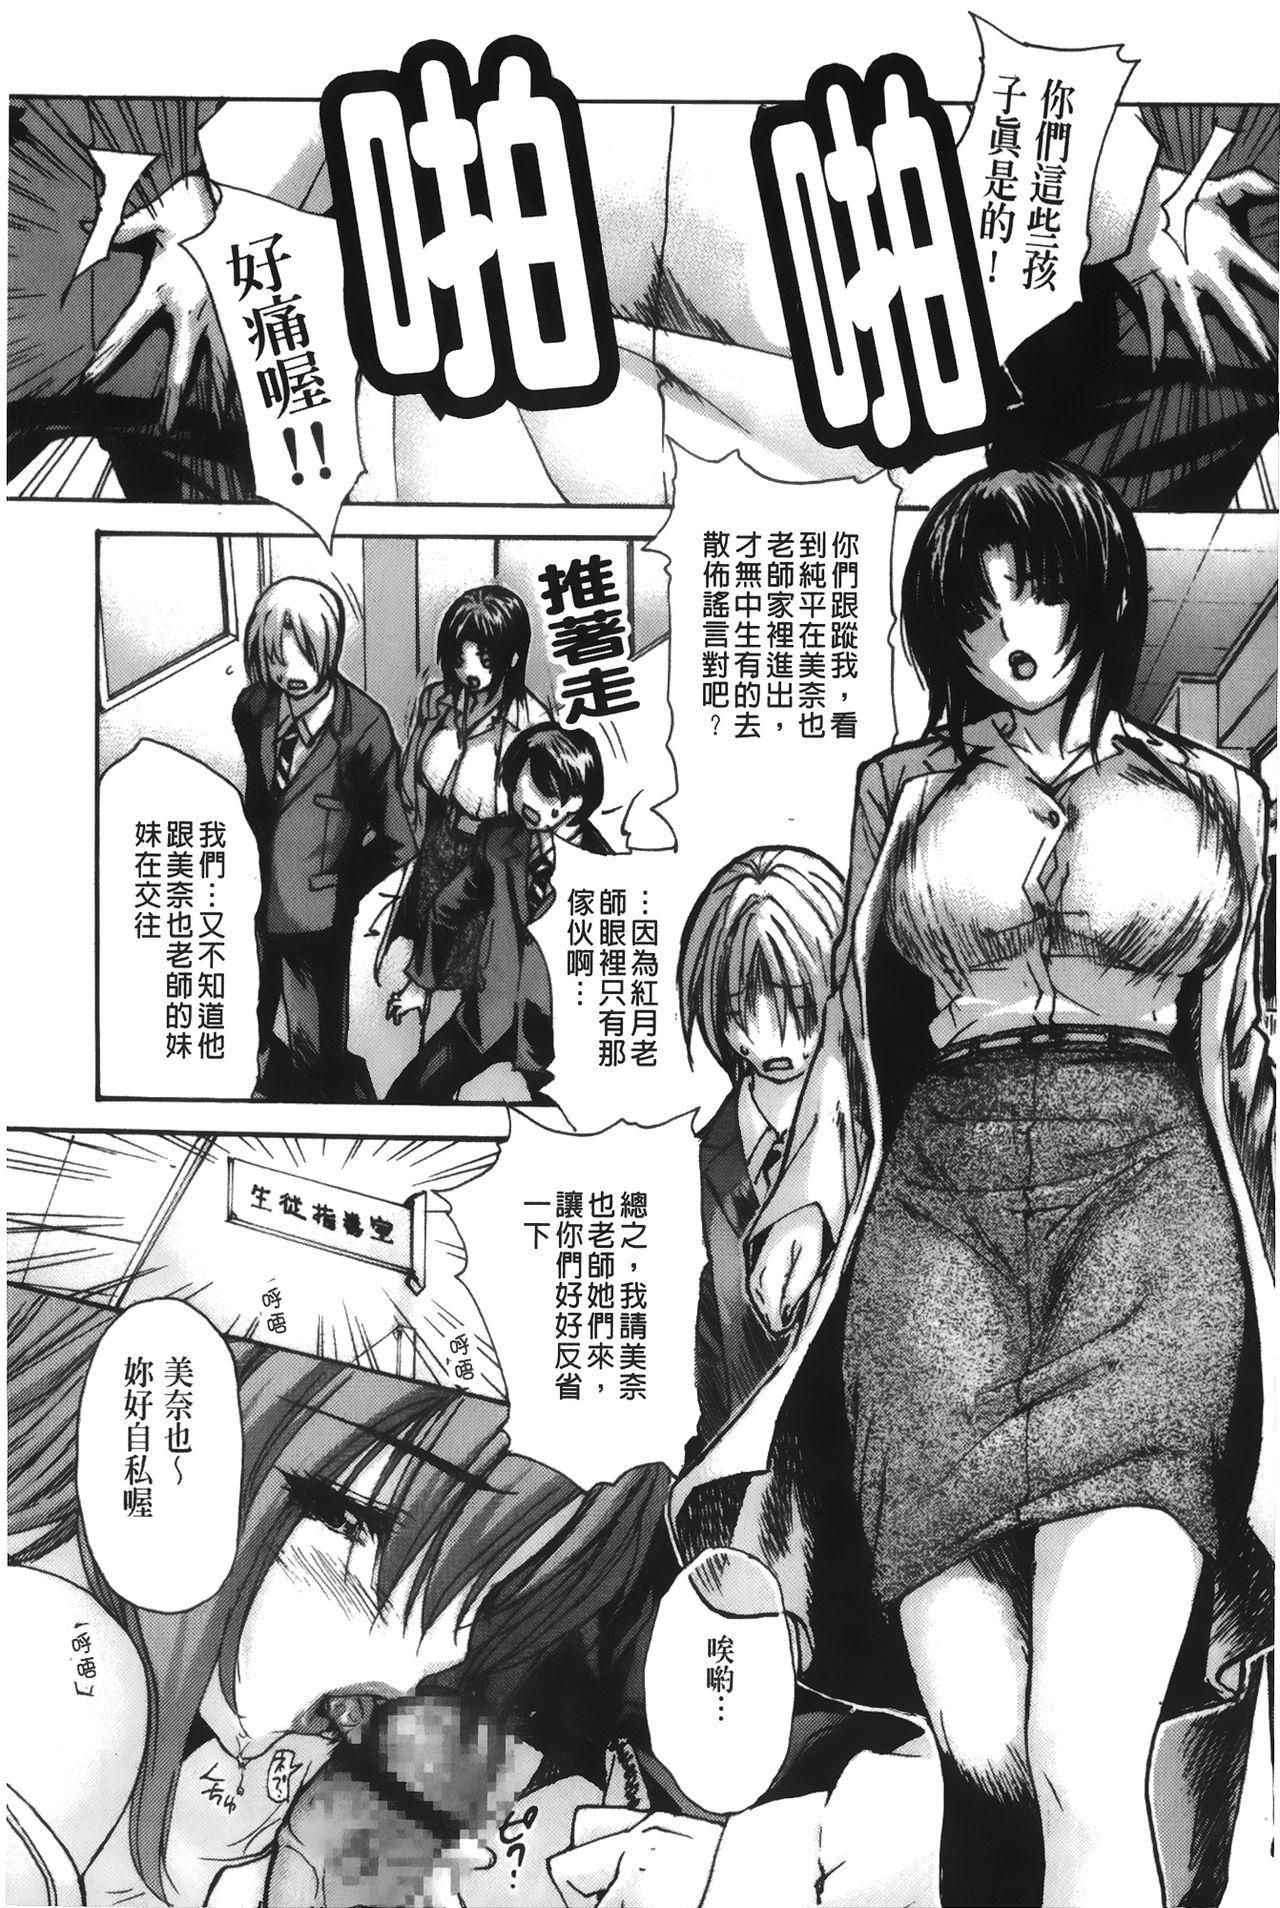 Tonari no Minano Sensei 4 | 隔壁的美奈乃老師 4 143